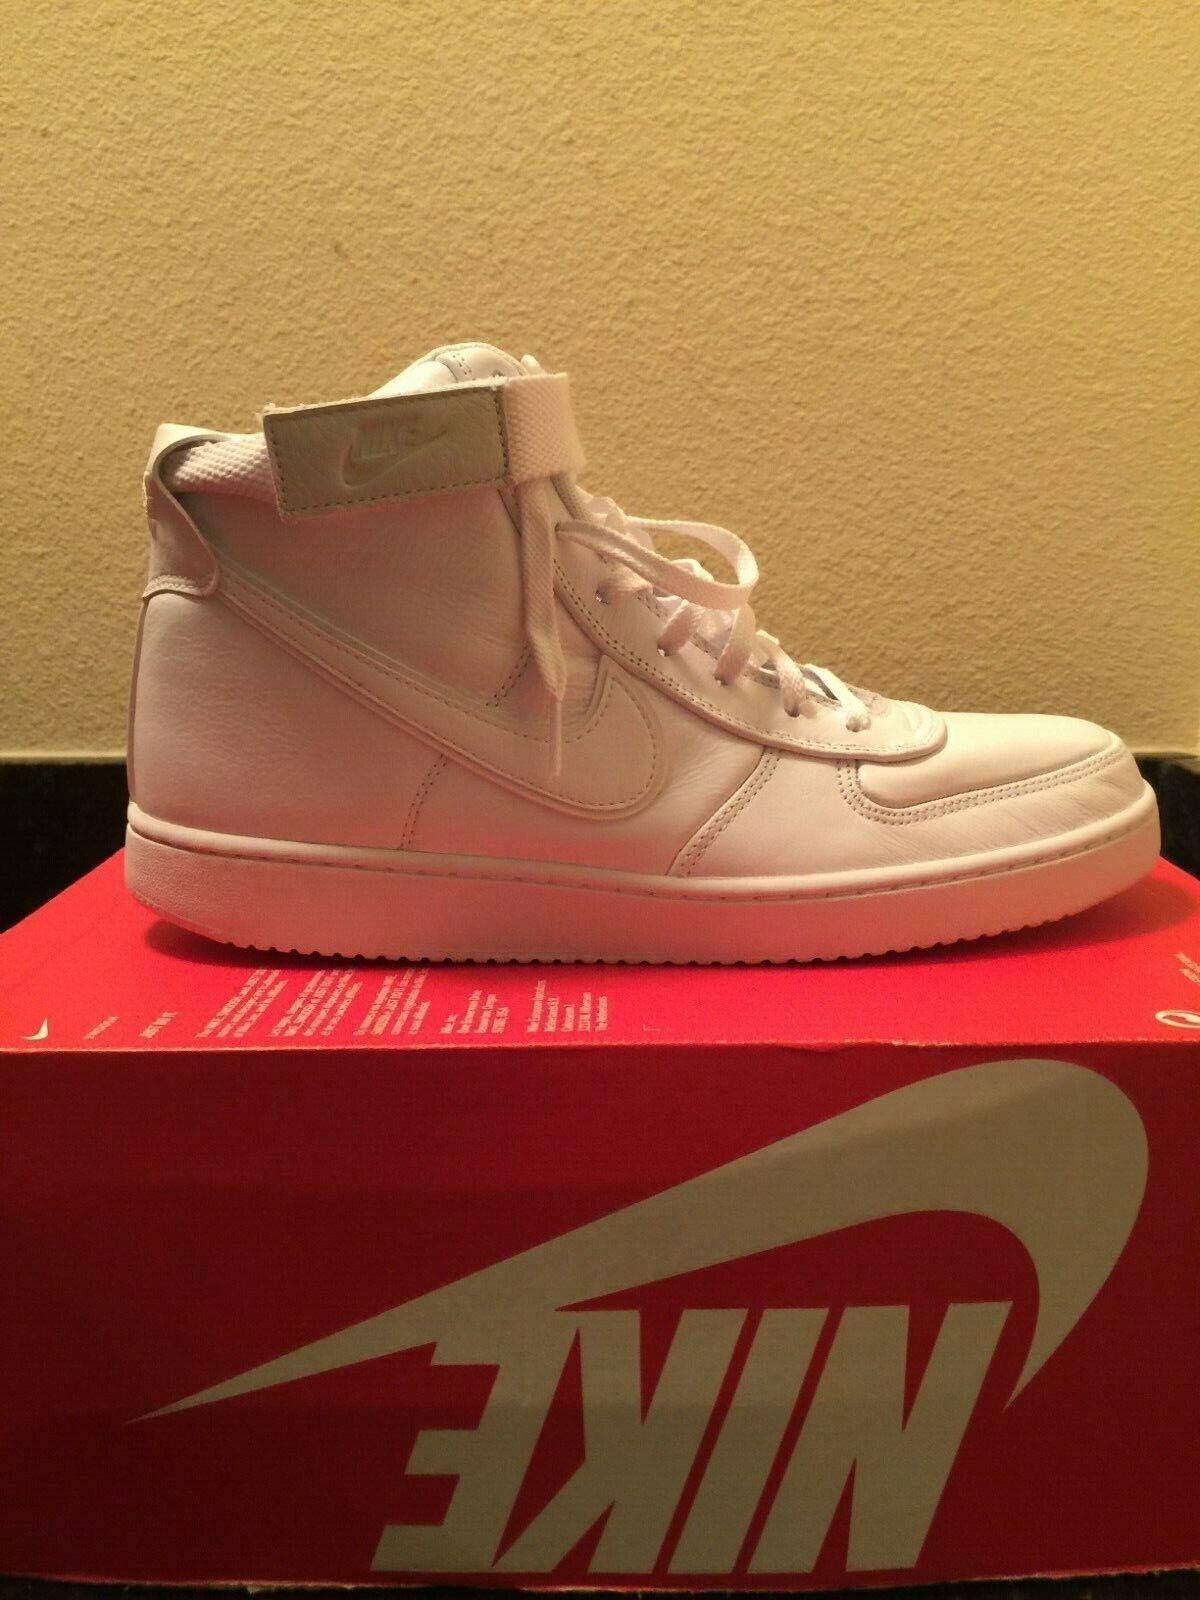 Nike Vandal High Supreme LTR AH8518-100 White Size 9.5 Leather John Elliot Pack